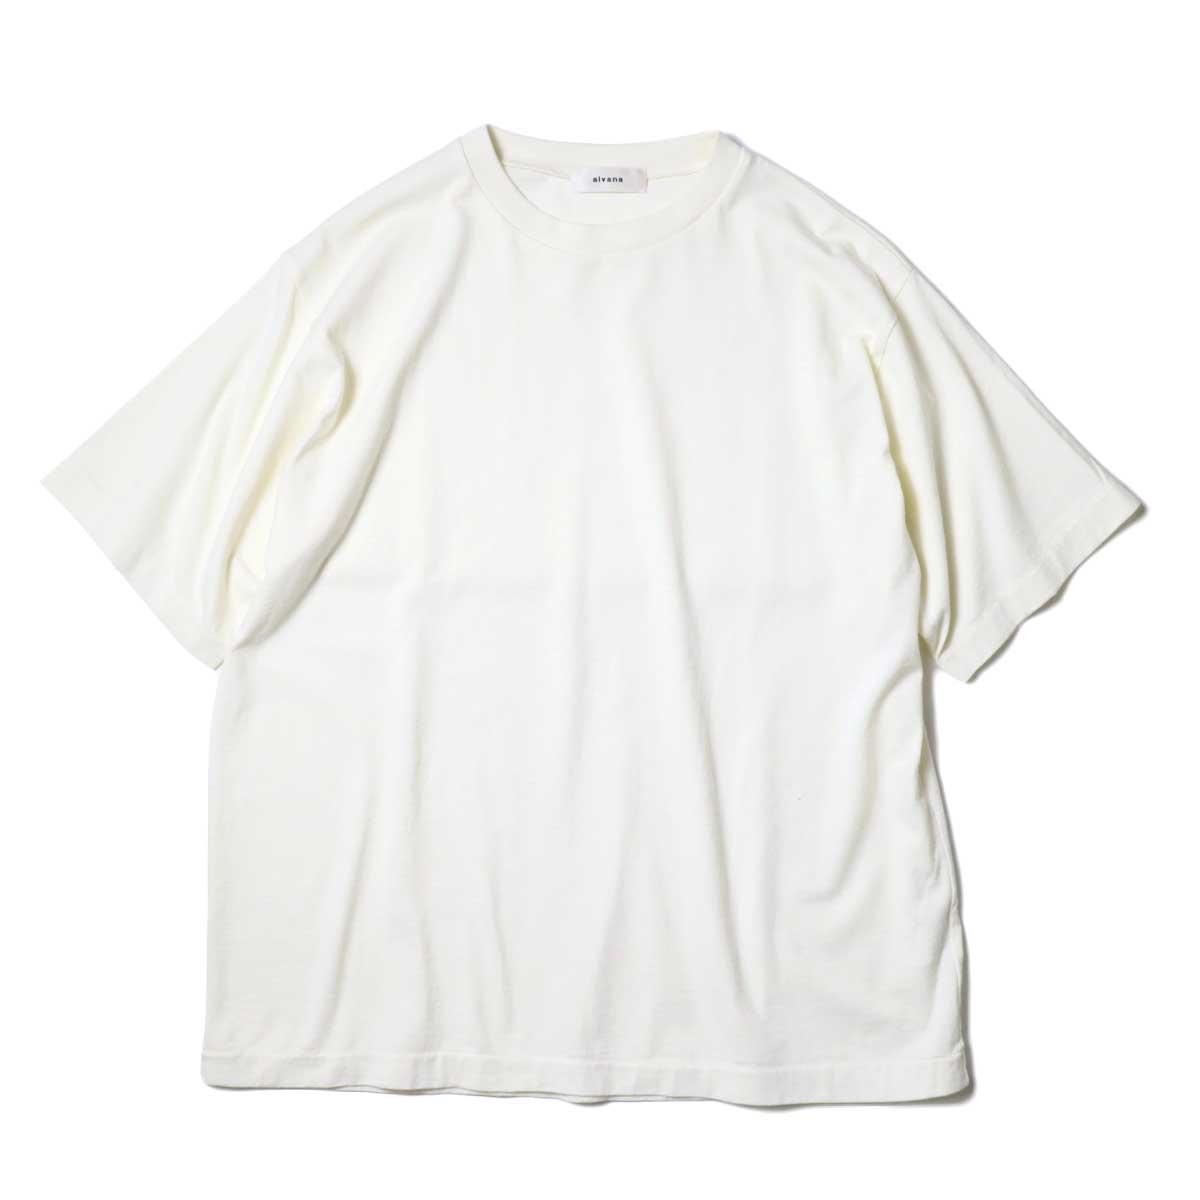 alvana / Dairy Oversize Tee Shirts (Ivory) 正面